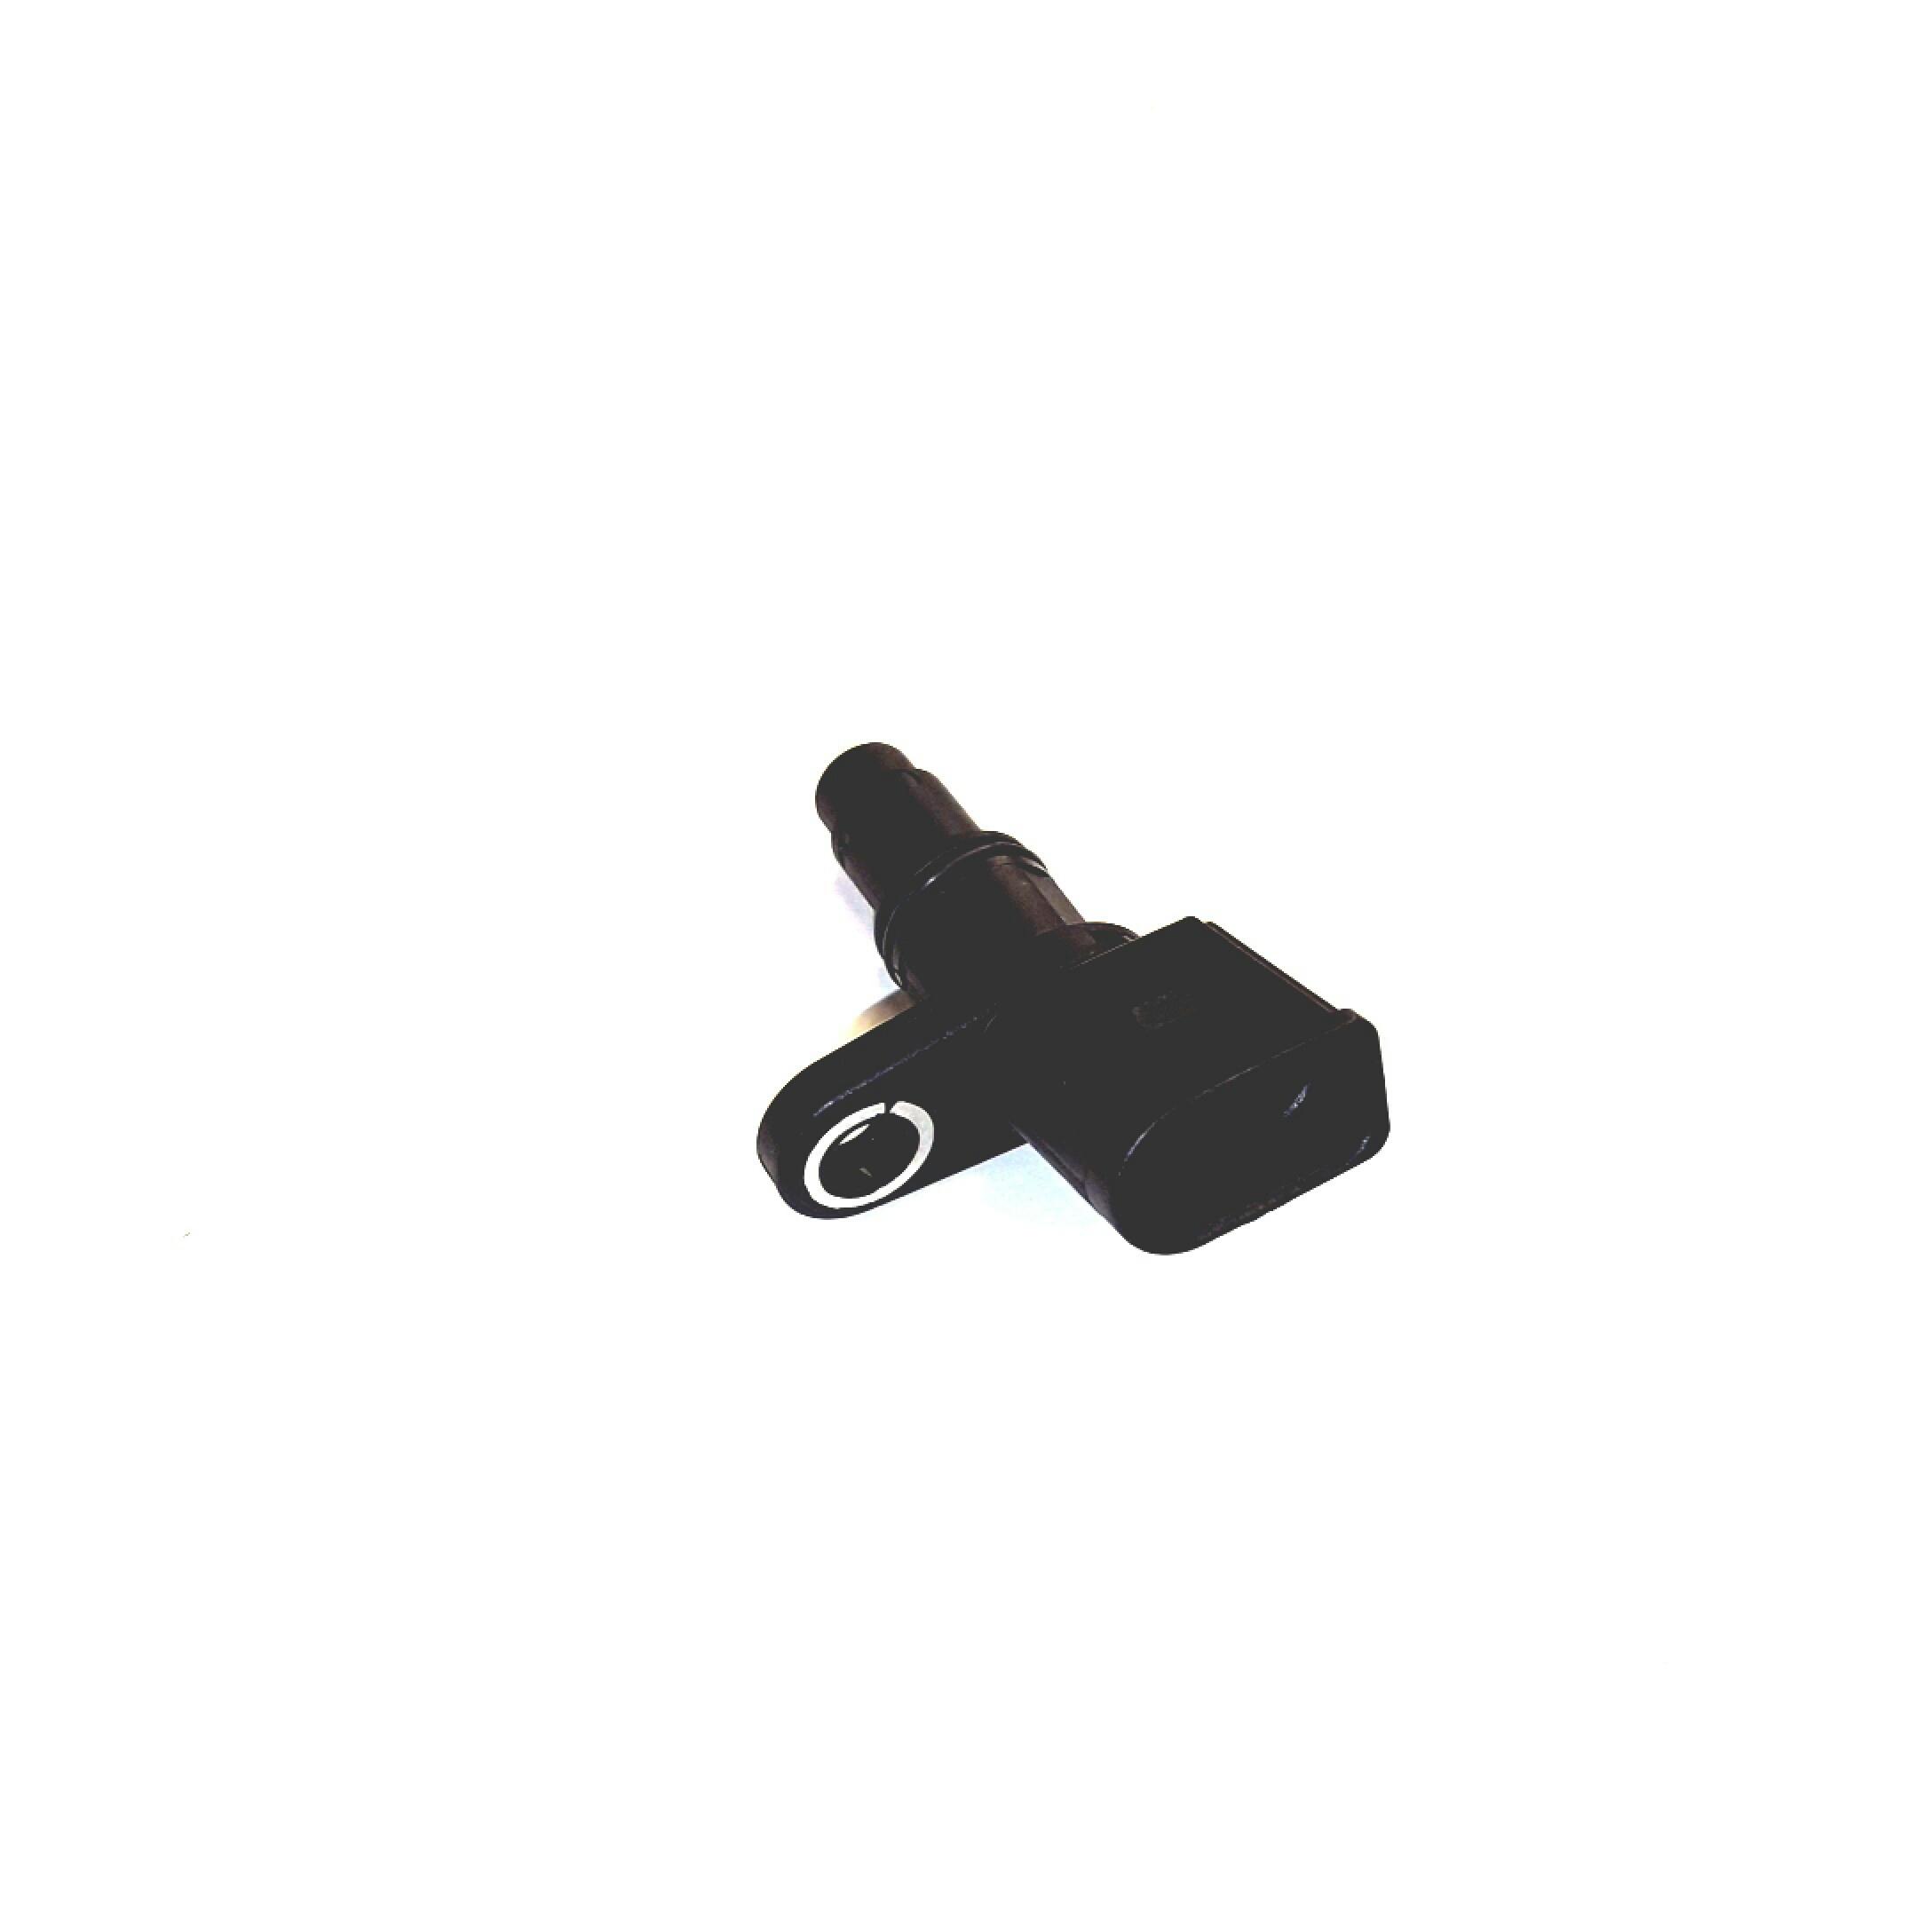 070907601A -. Liter, Sensor, System